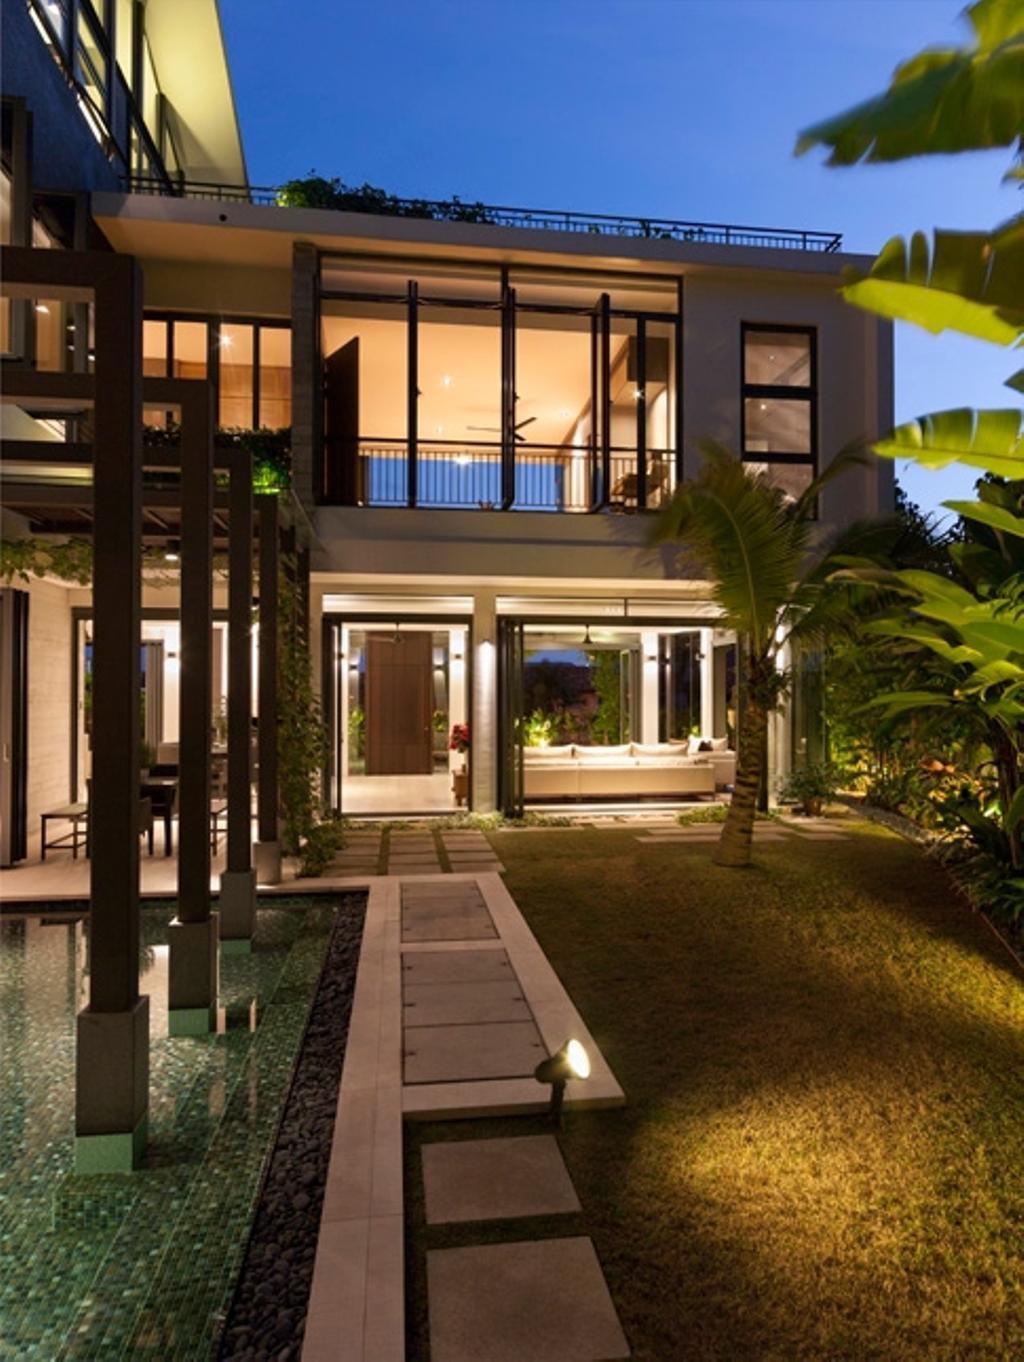 Modern, Landed, Garden, Siglap Avenue, Architect, Timur Designs, Window, Path, Appliance, Electrical Device, Oven, Walkway, Building, House, Housing, Villa